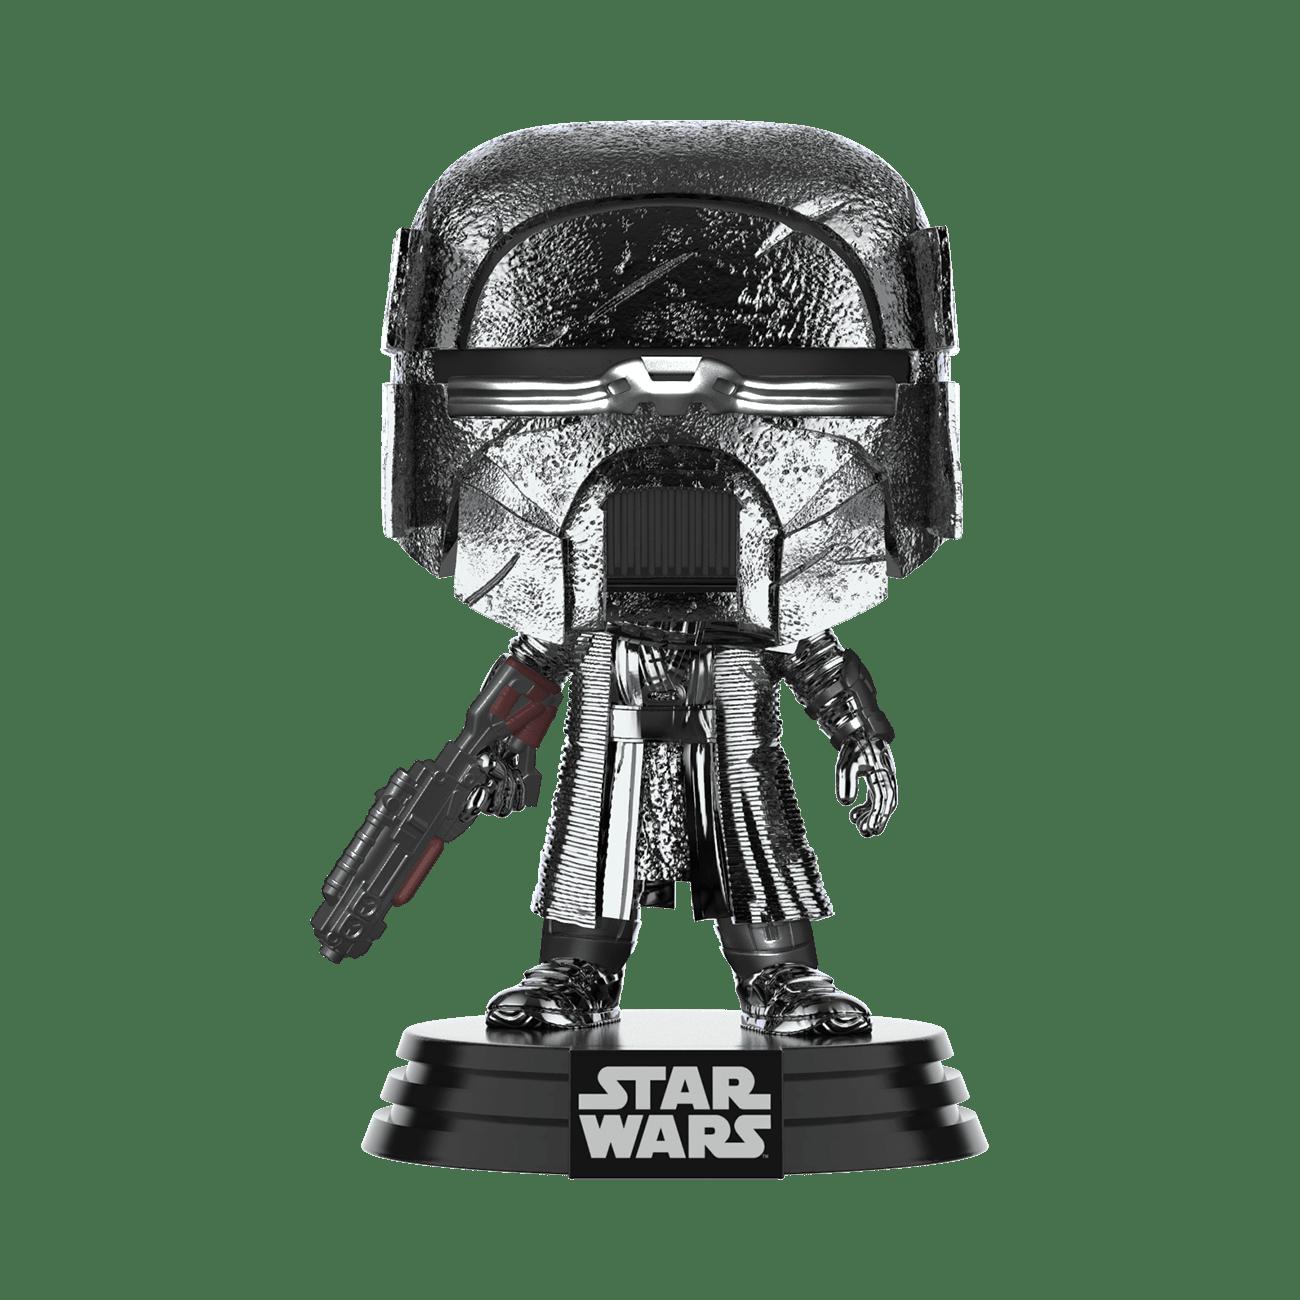 Star Wars: The Rise of Skywalker Hematite Chrome Knight of Ren Blaster Pop! Vinyl Figure